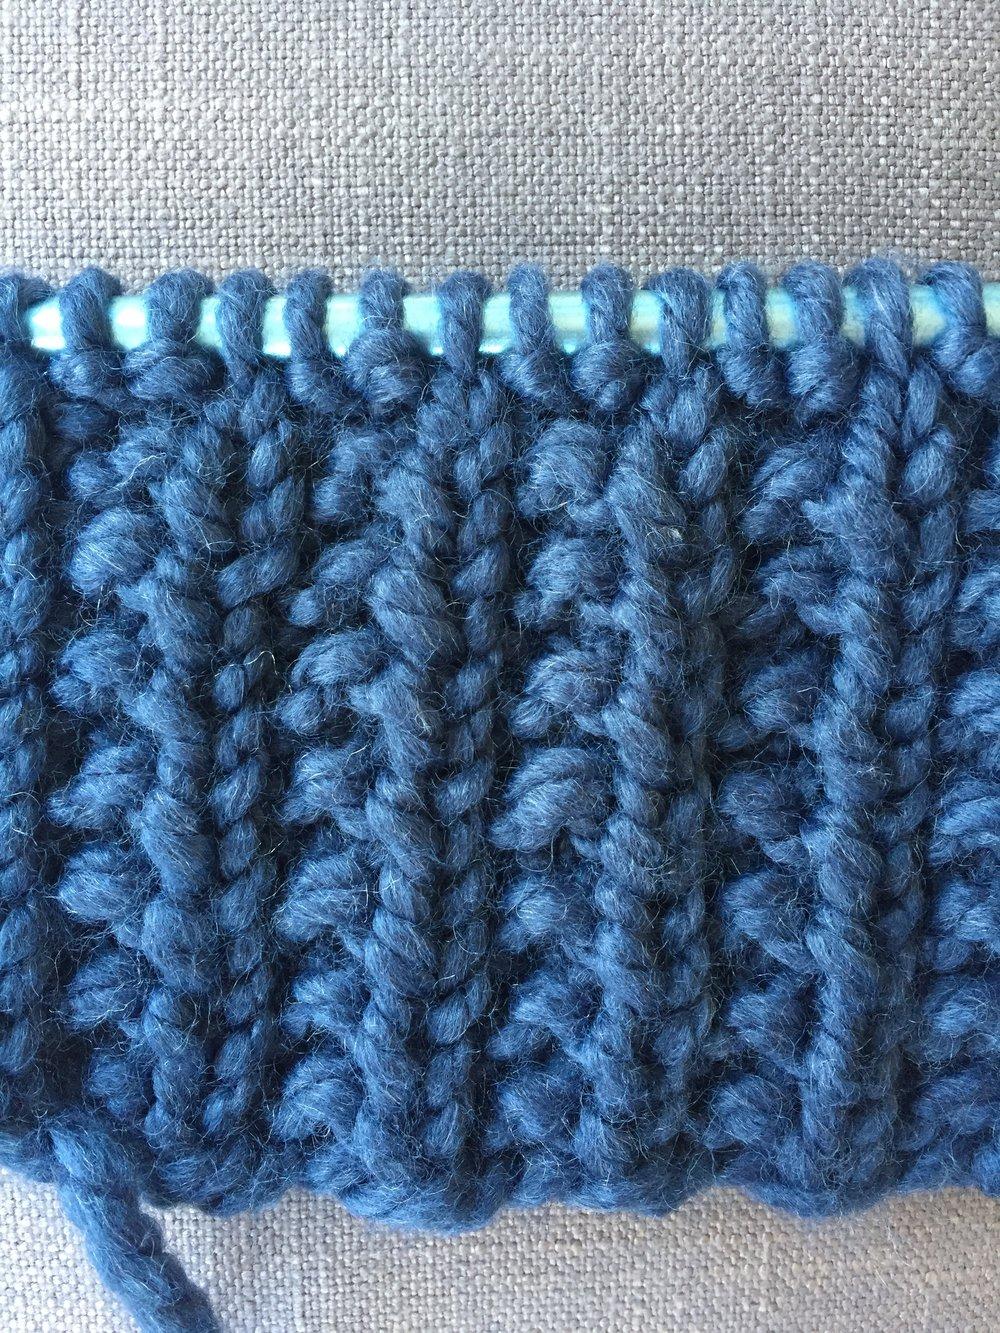 How to Knit the Farrow Stitch — Knit Freely